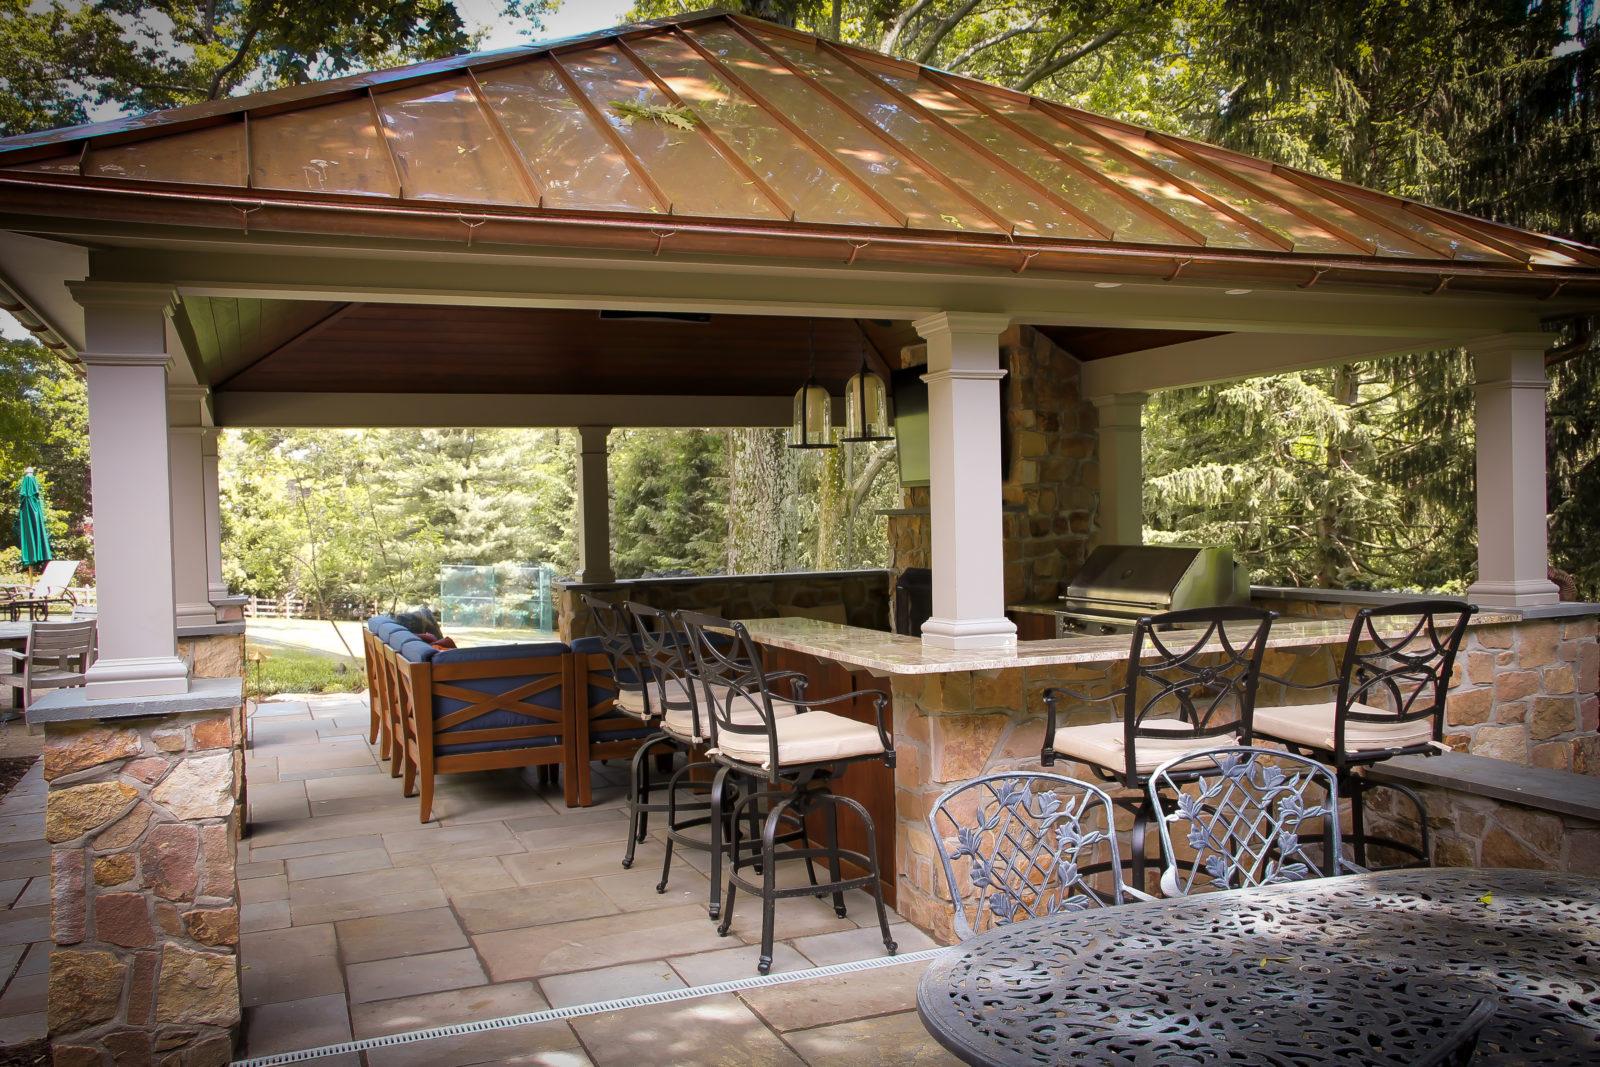 luxurious backyard pavilion living space pa ct md va